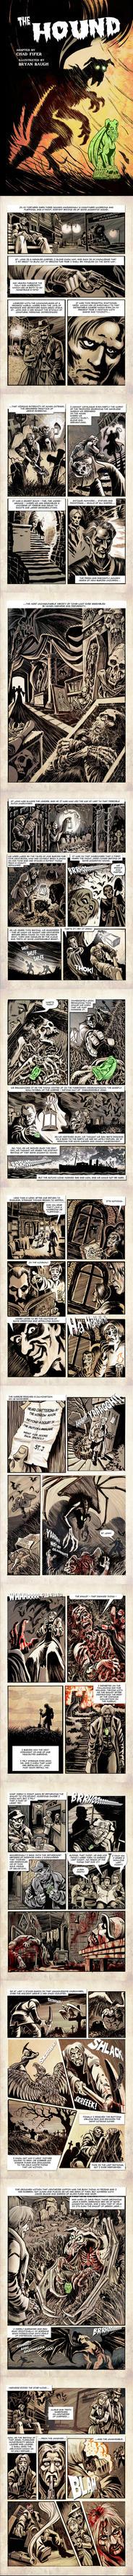 The Hound comic adaptation by BryanBaugh